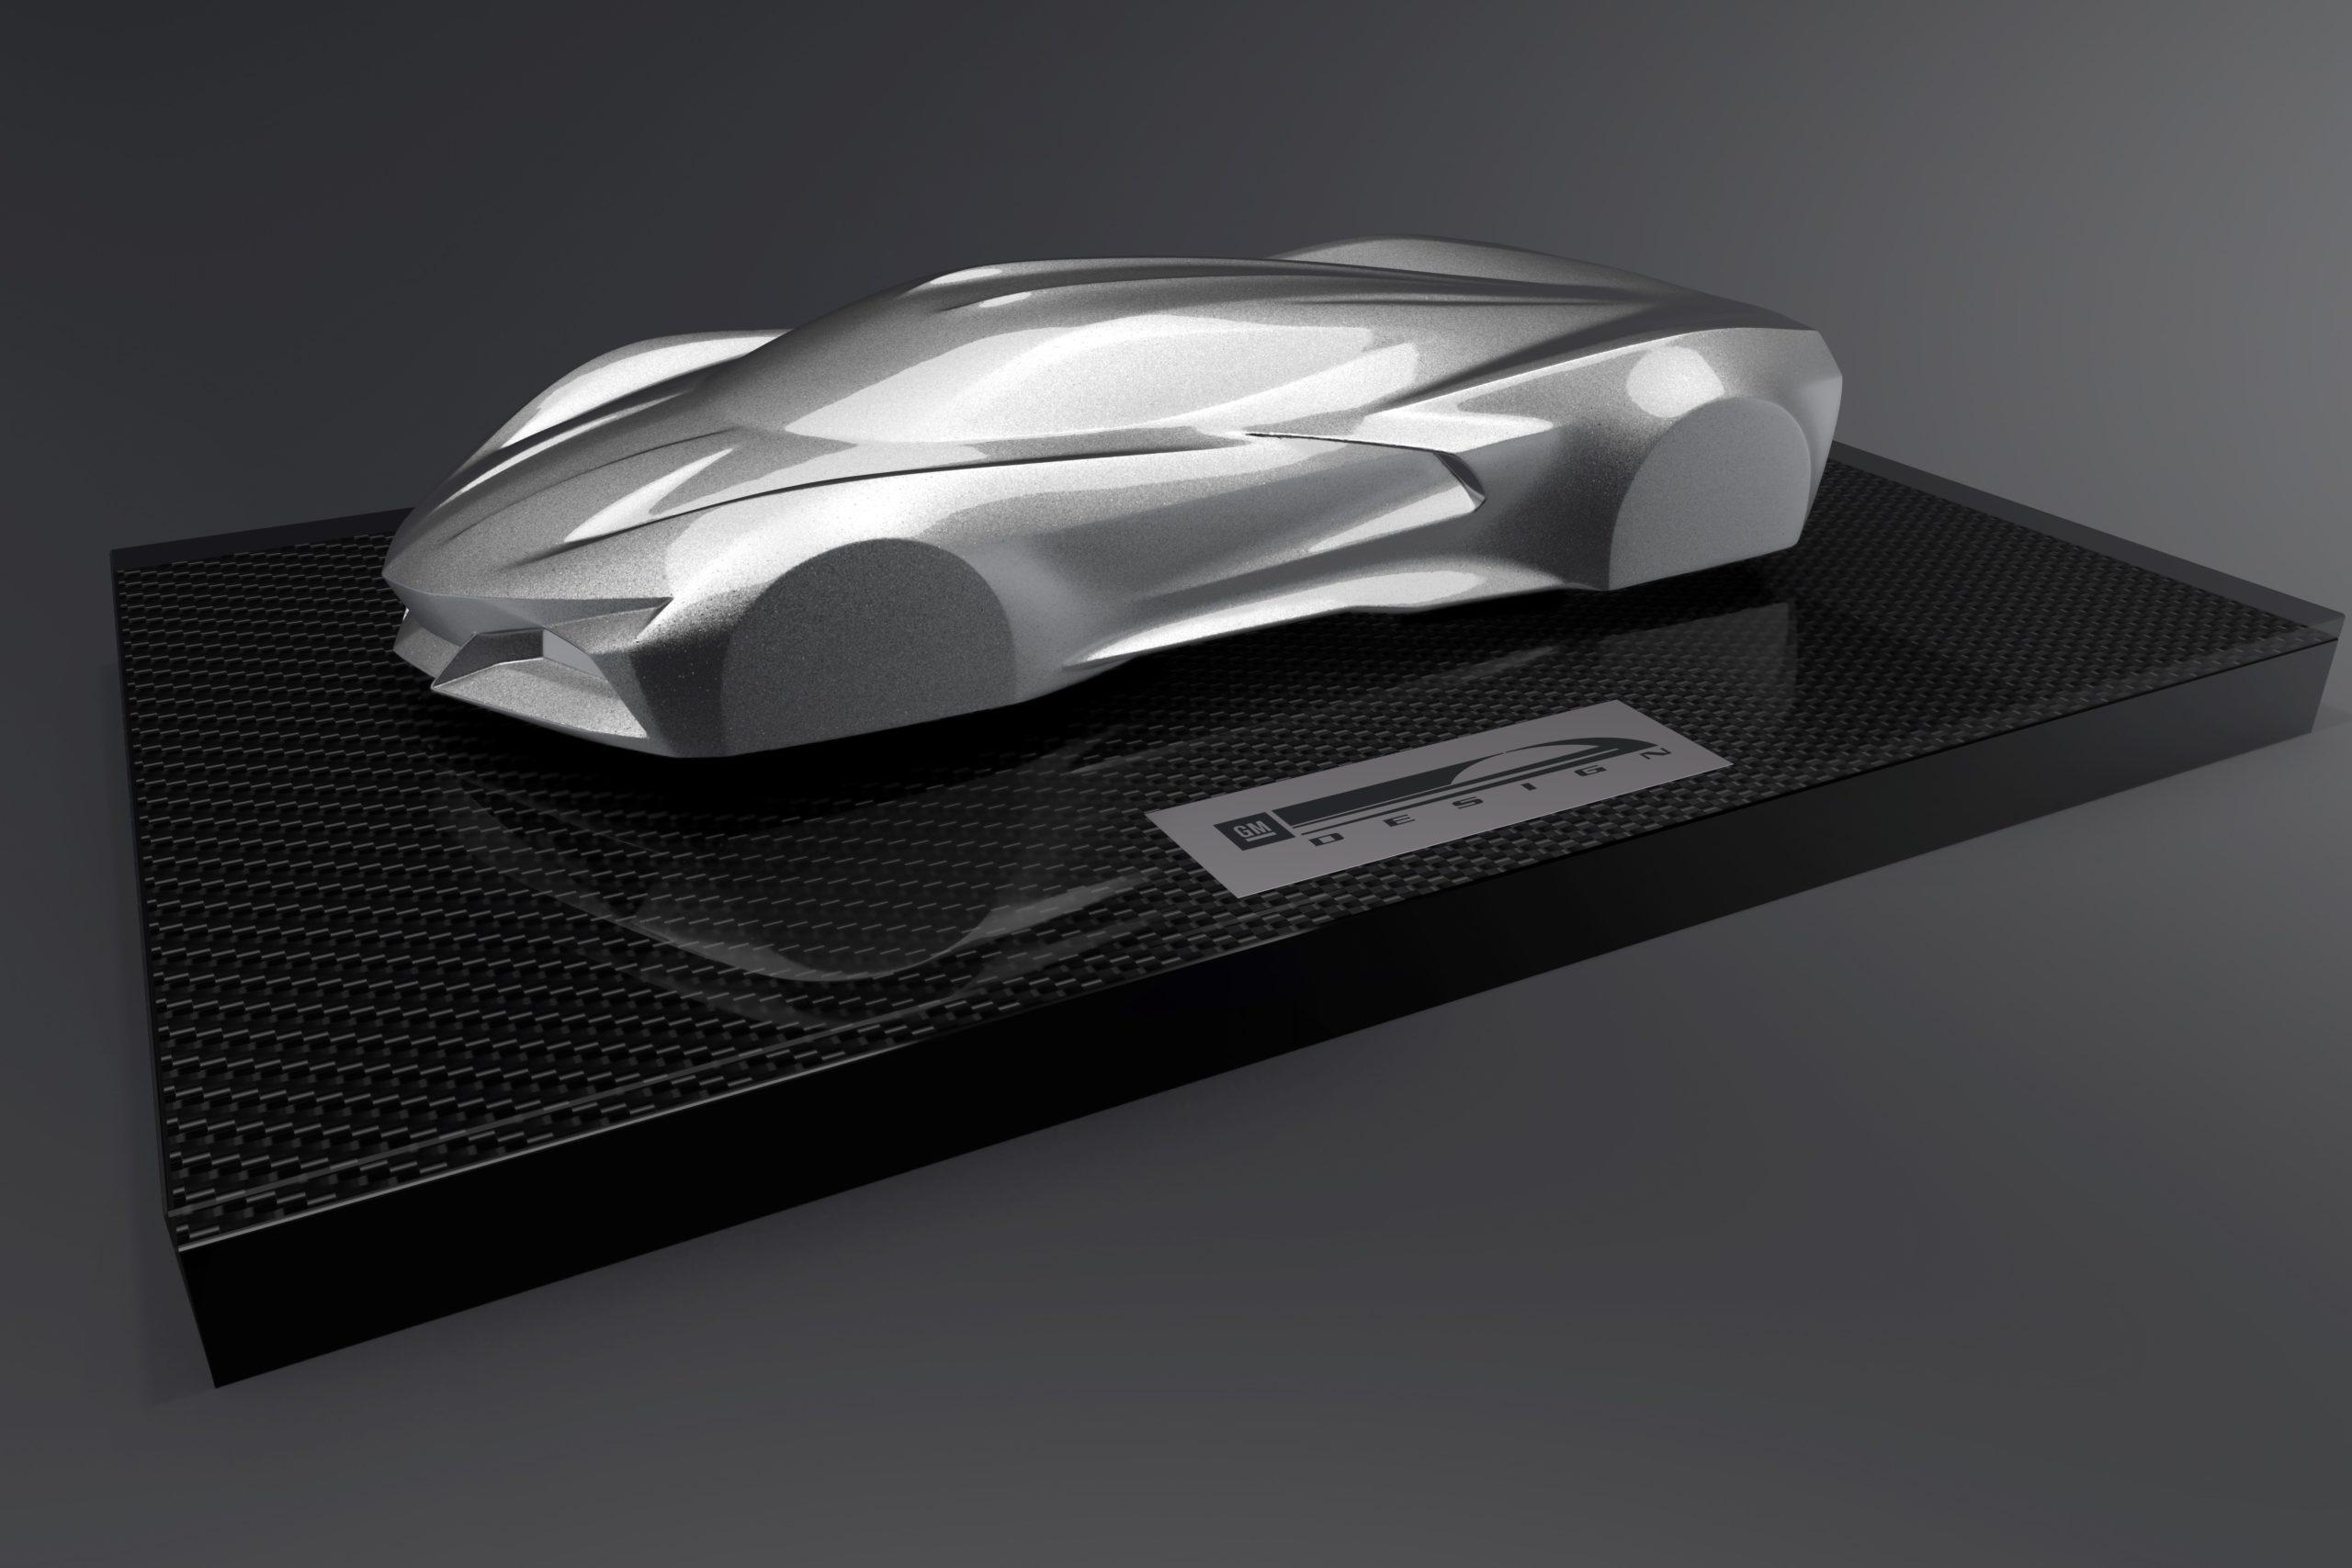 Newly designed next generation 2020 Corvette Stingray special edition trophy